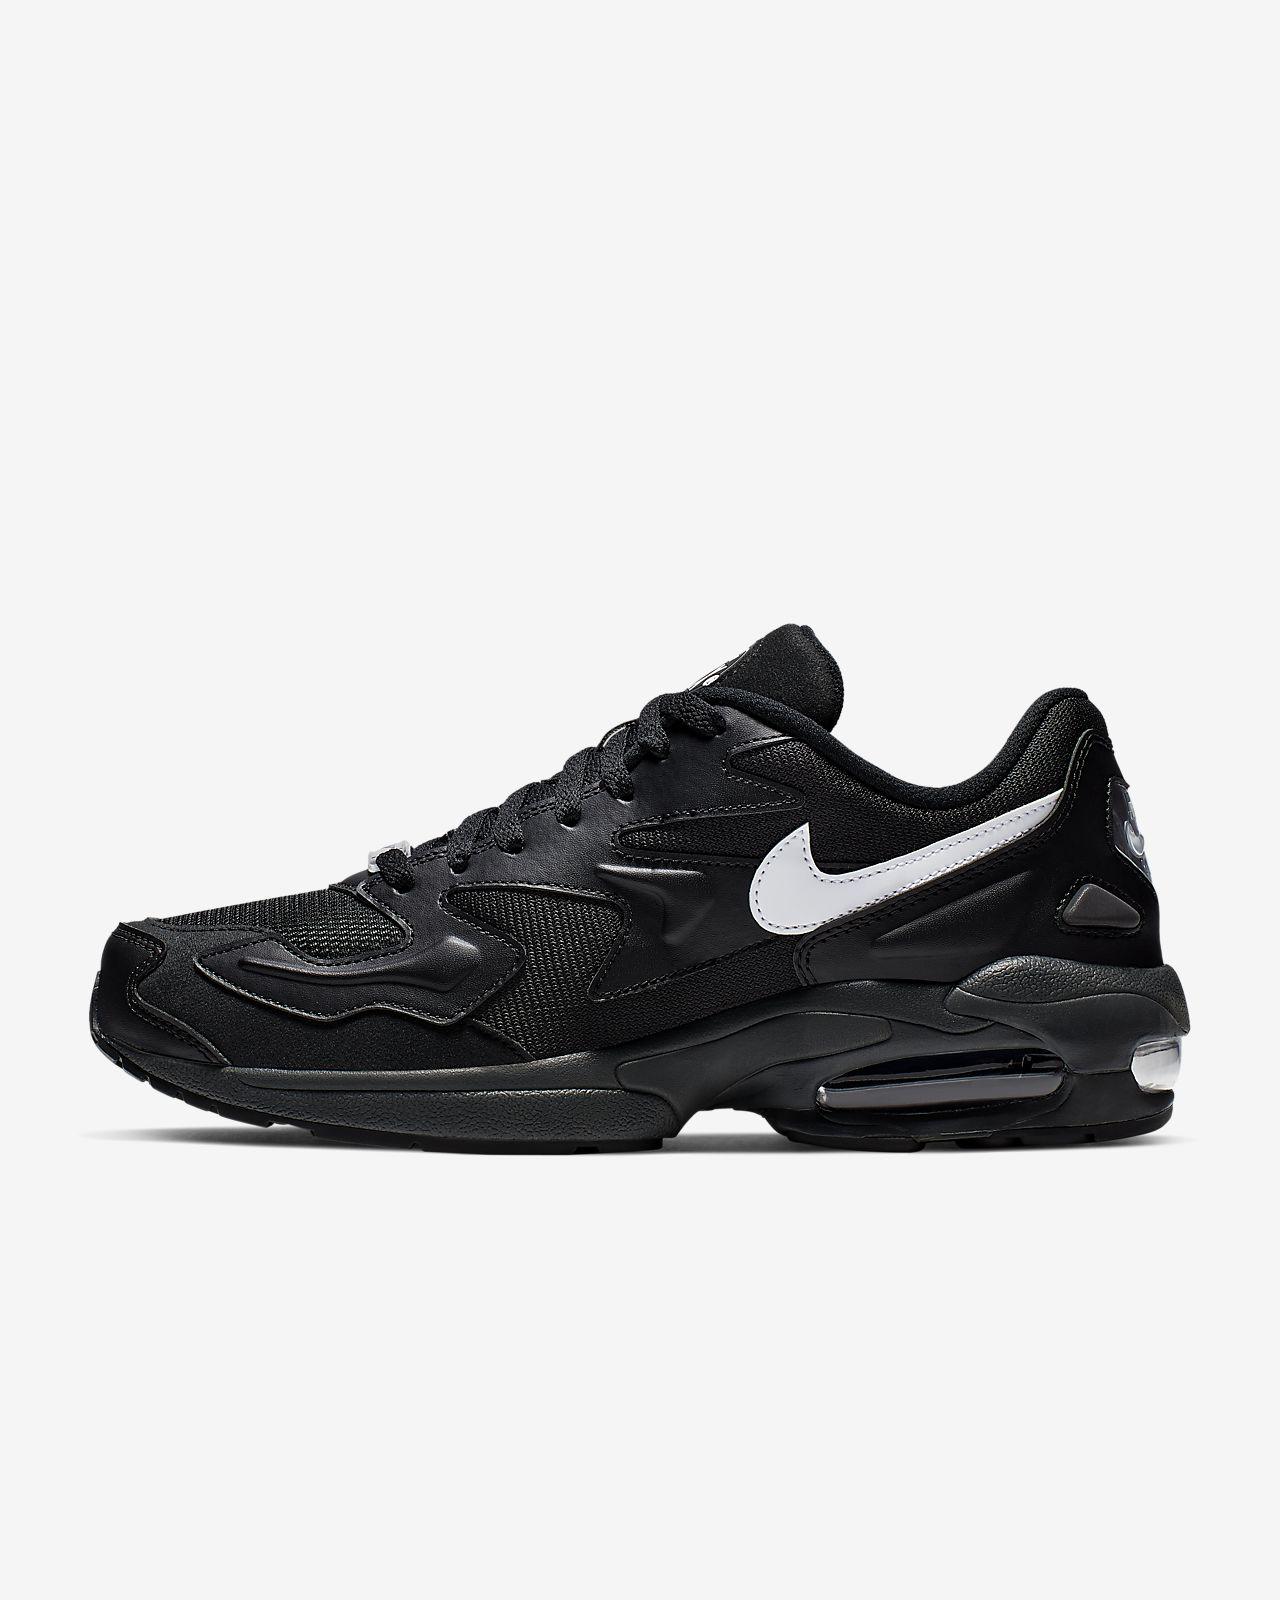 Homme Nike Air Max2 Light Noir